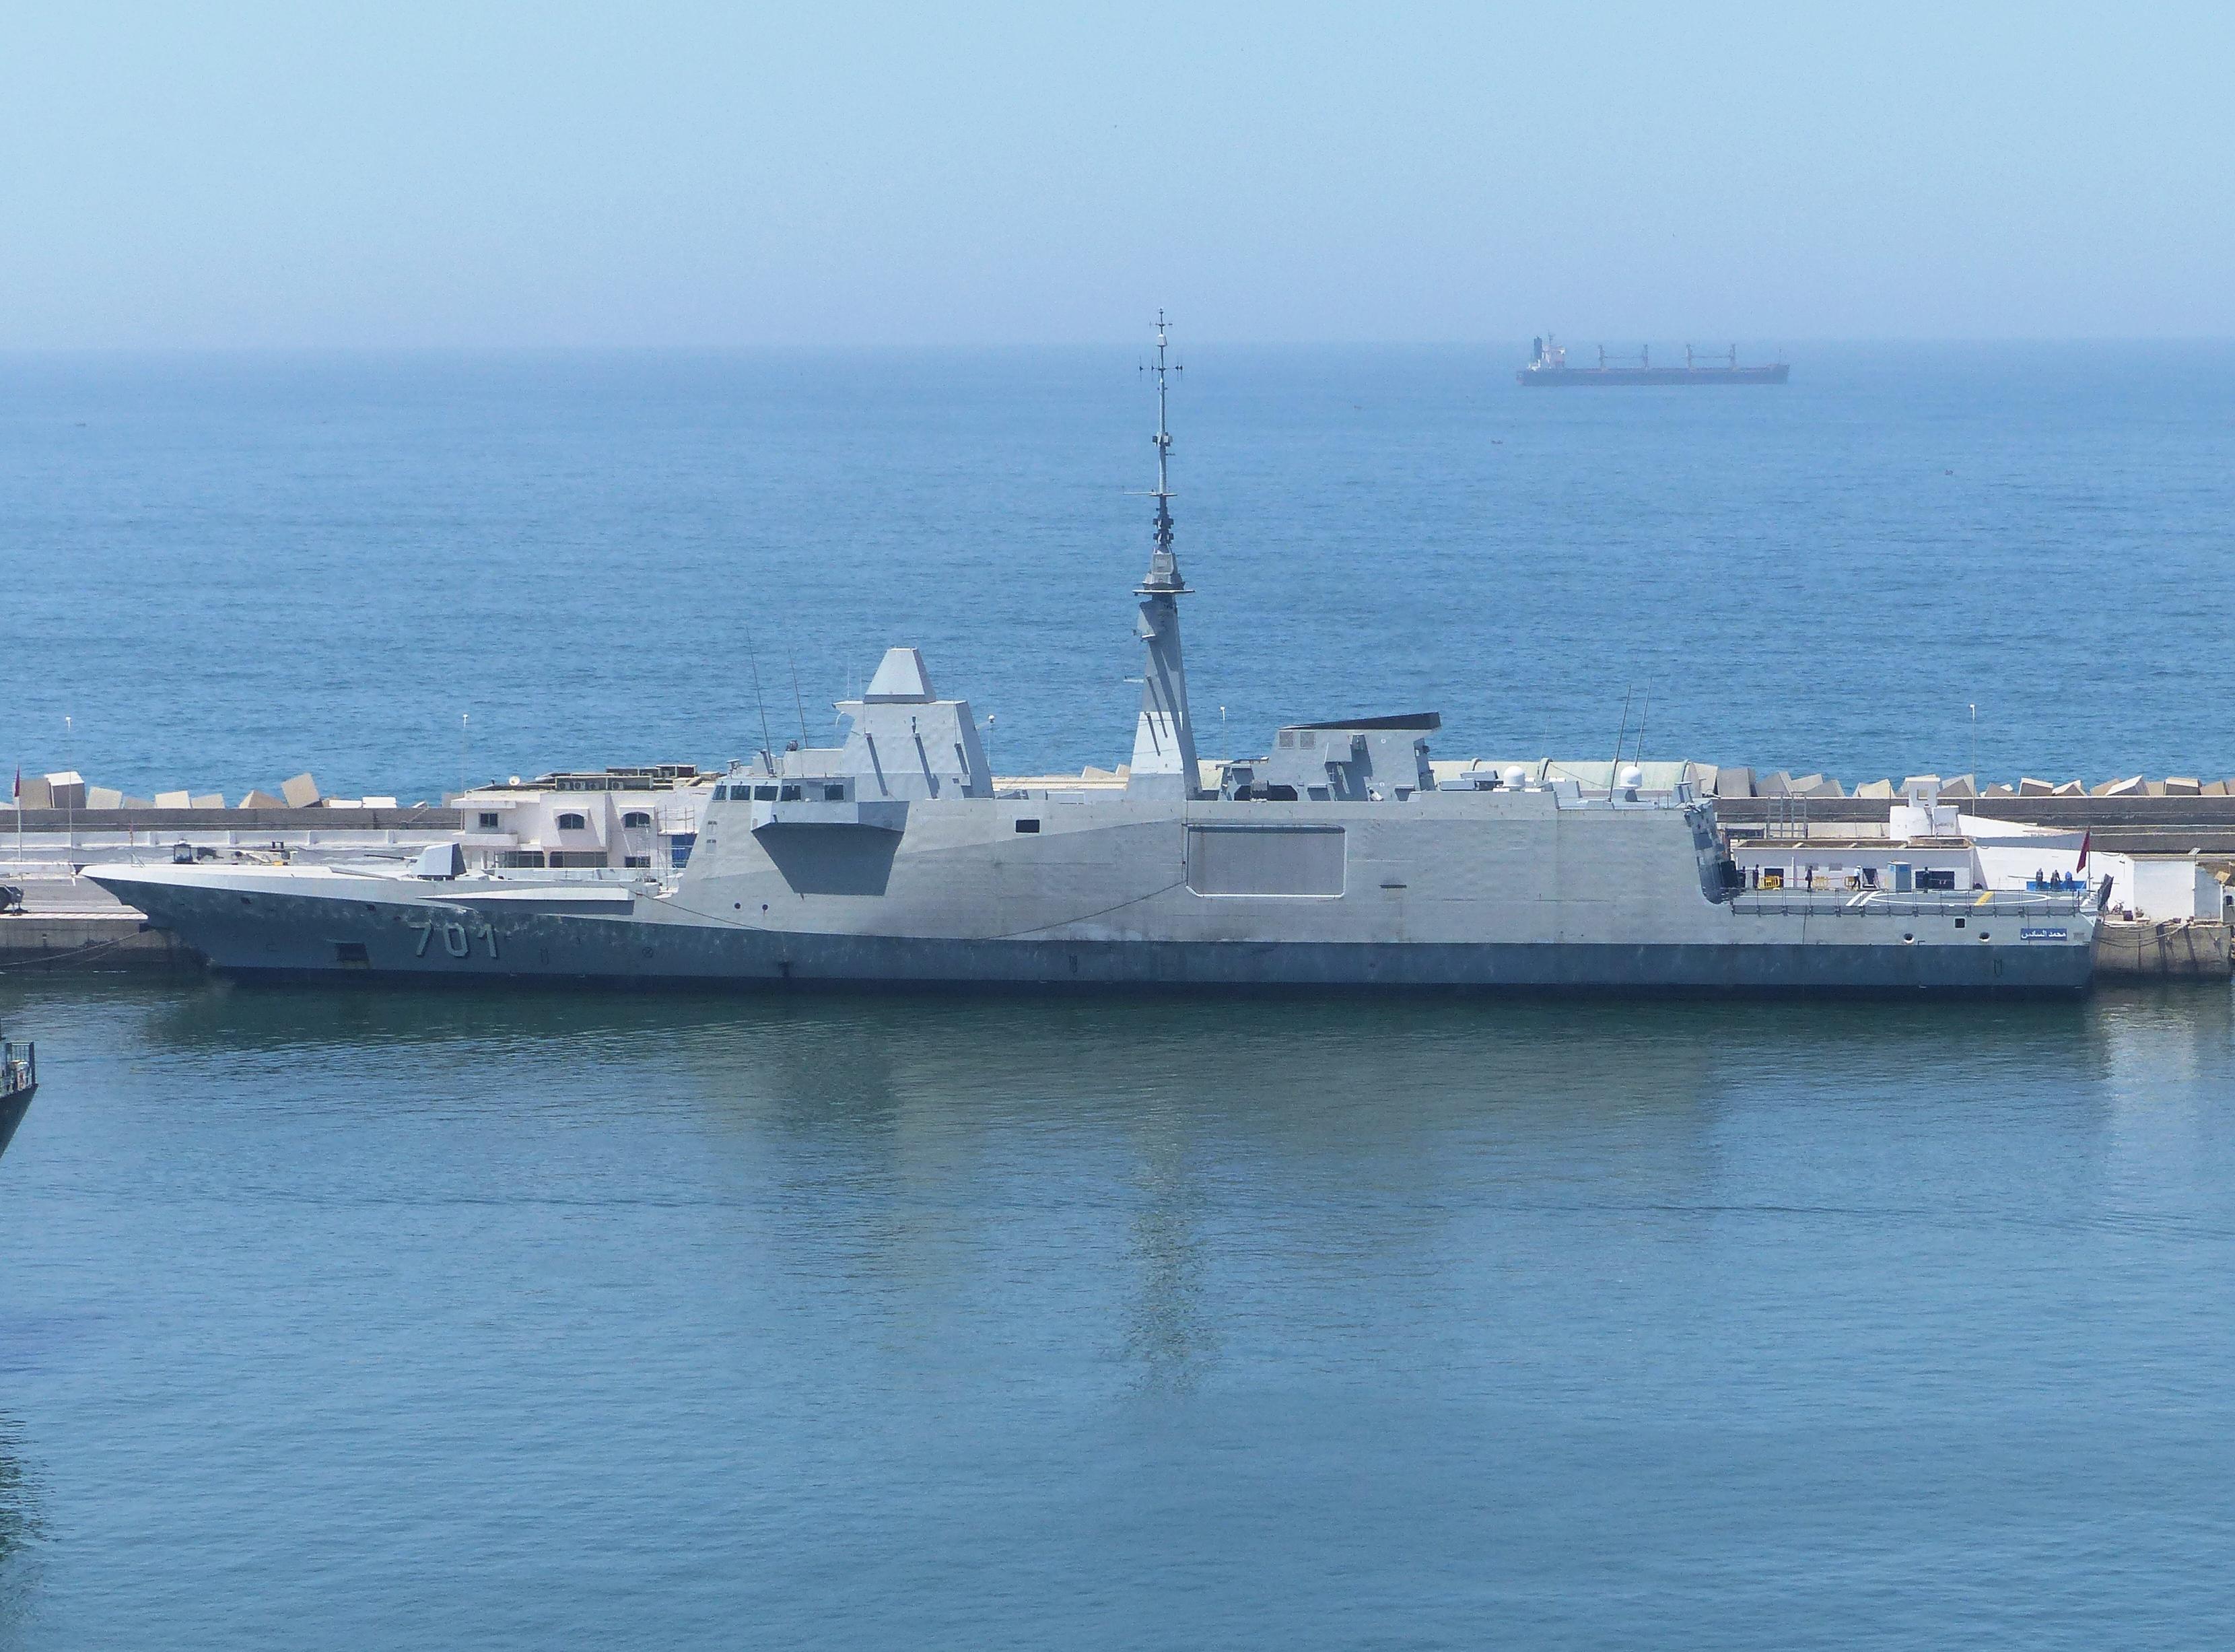 Royal Moroccan Navy FREMM Frigate / FREMM Marocaine - Mohammed VI - Page 13 3038132